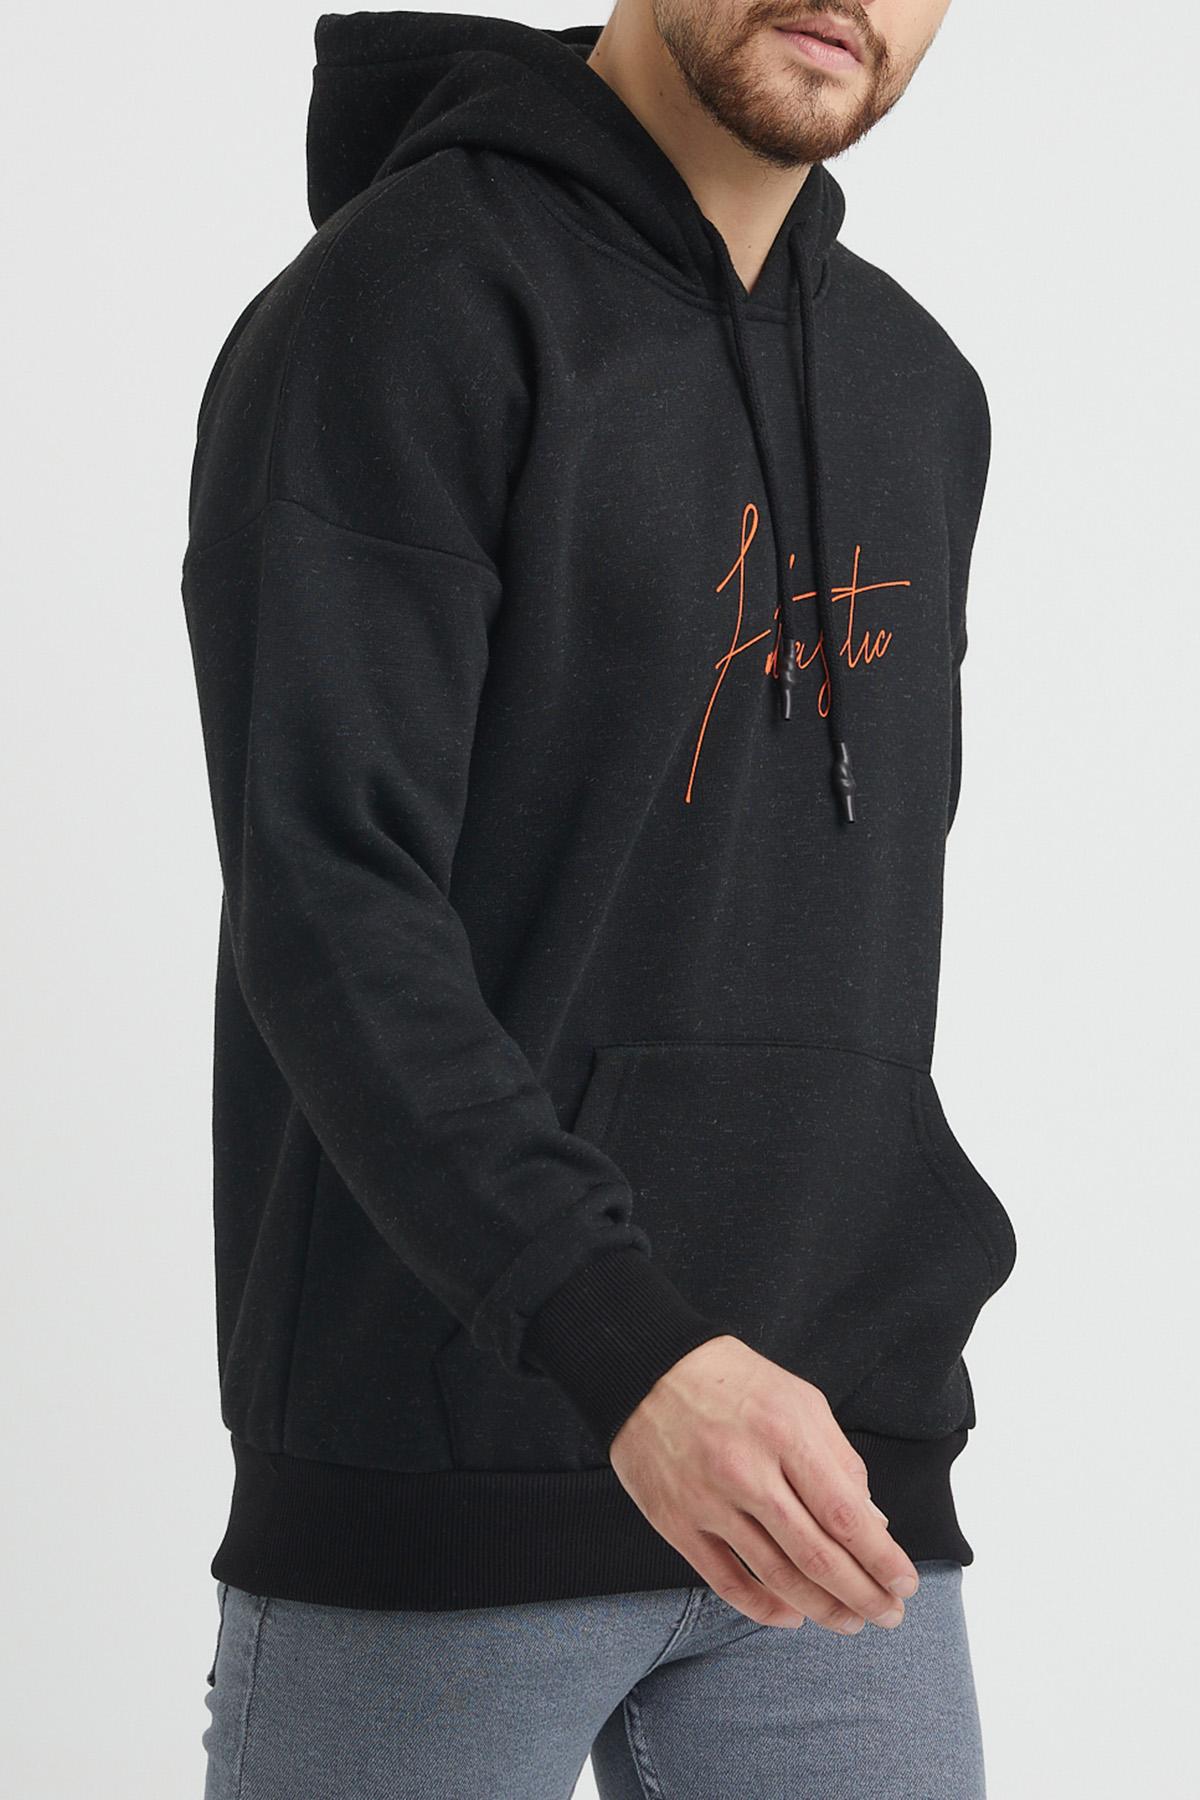 XHAN - Siyah Baskılı Sweatshirt 1KXE8-44367-02